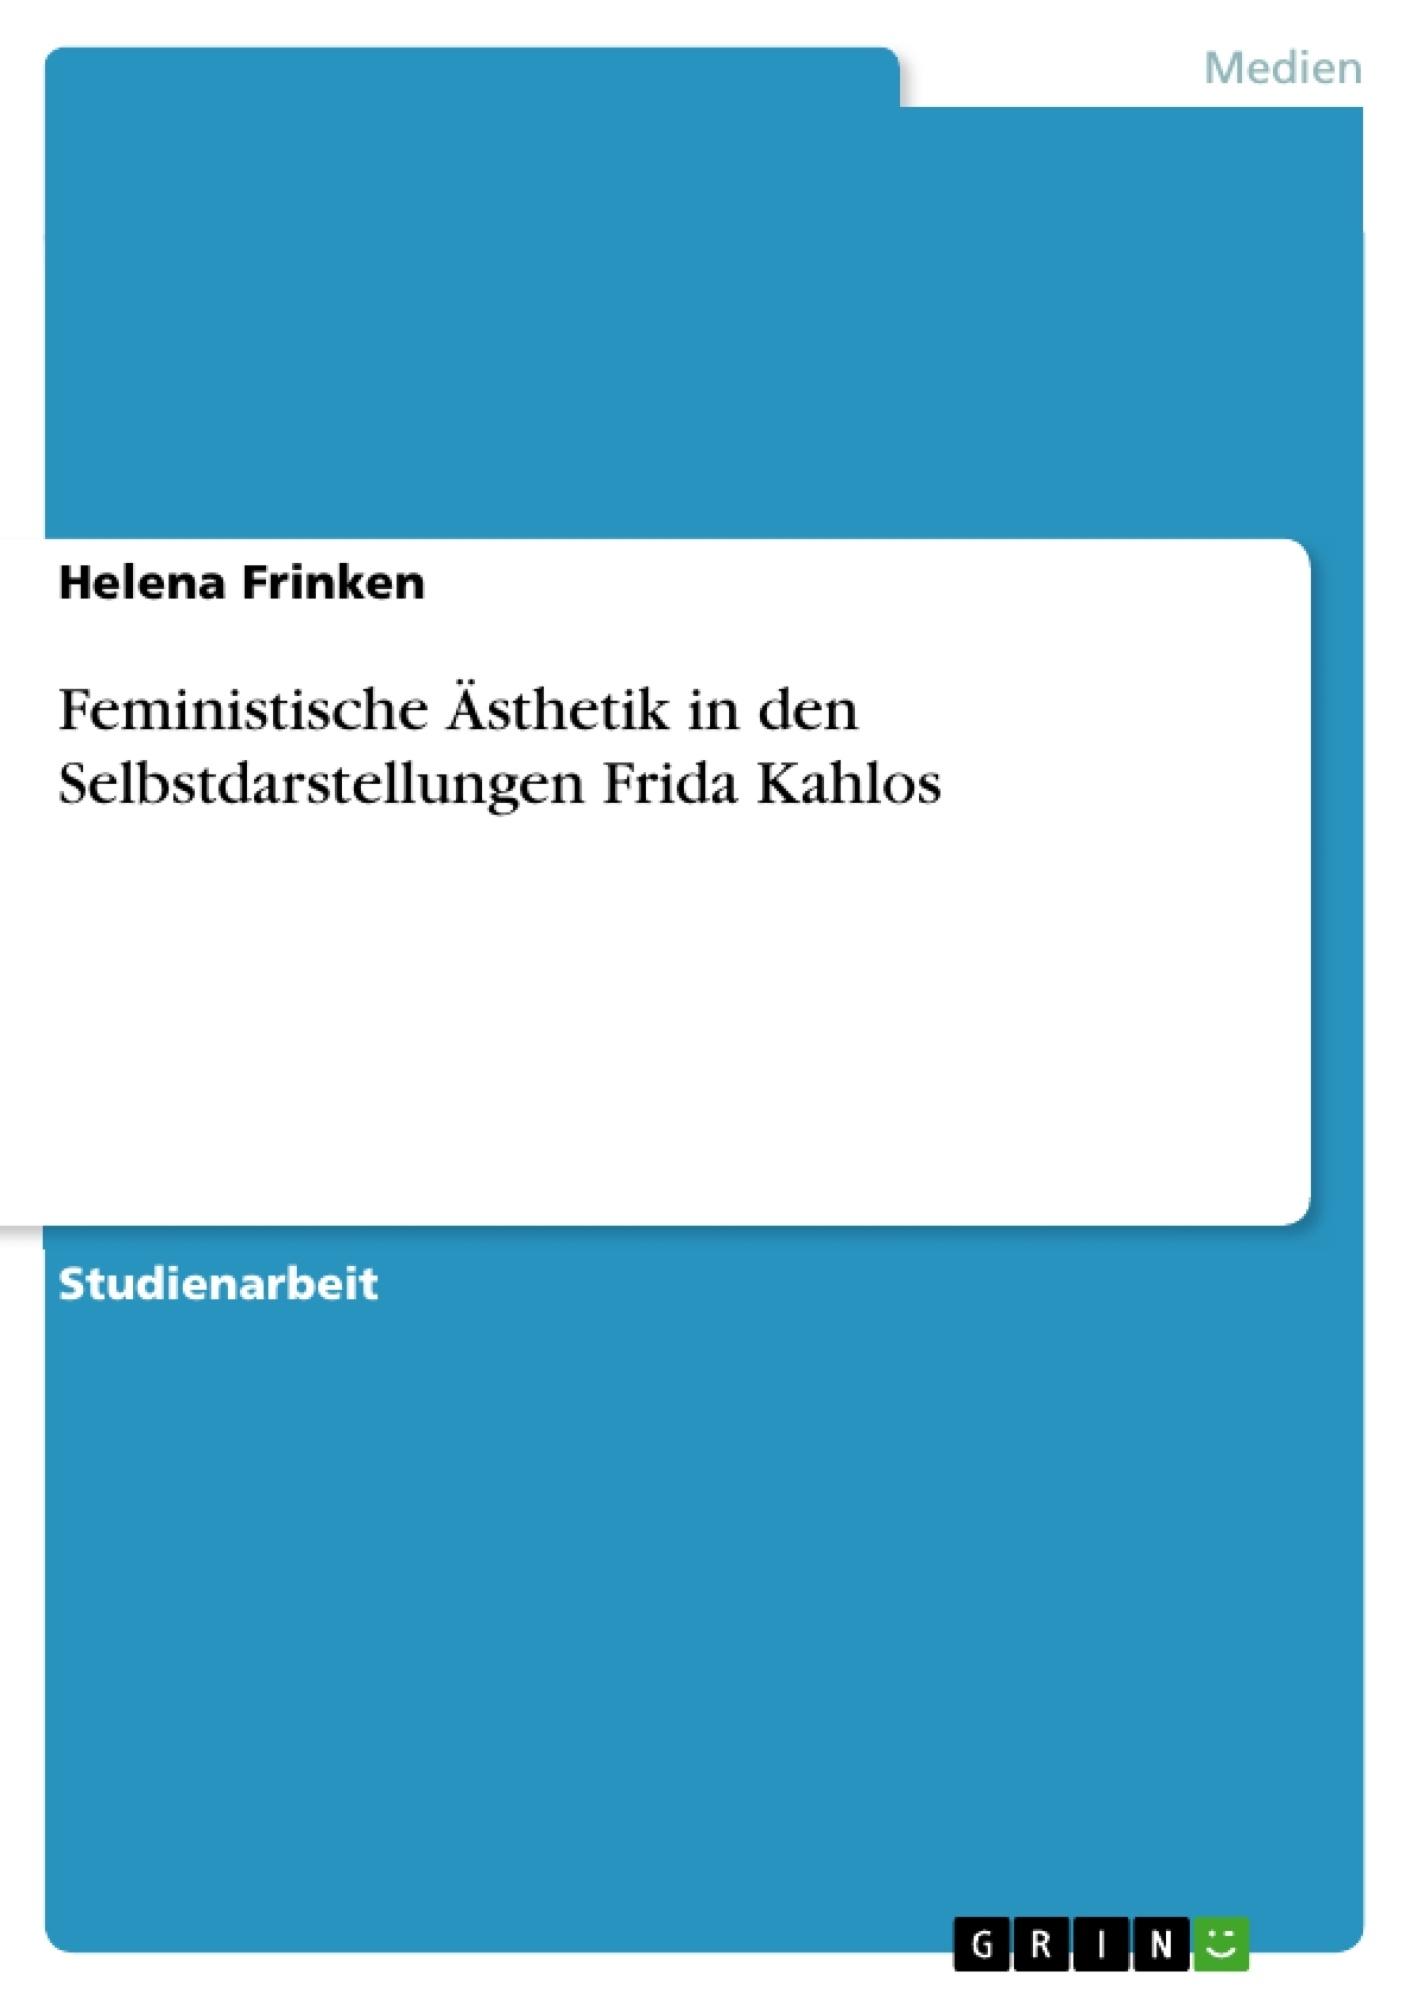 Titel: Feministische Ästhetik in den Selbstdarstellungen Frida Kahlos